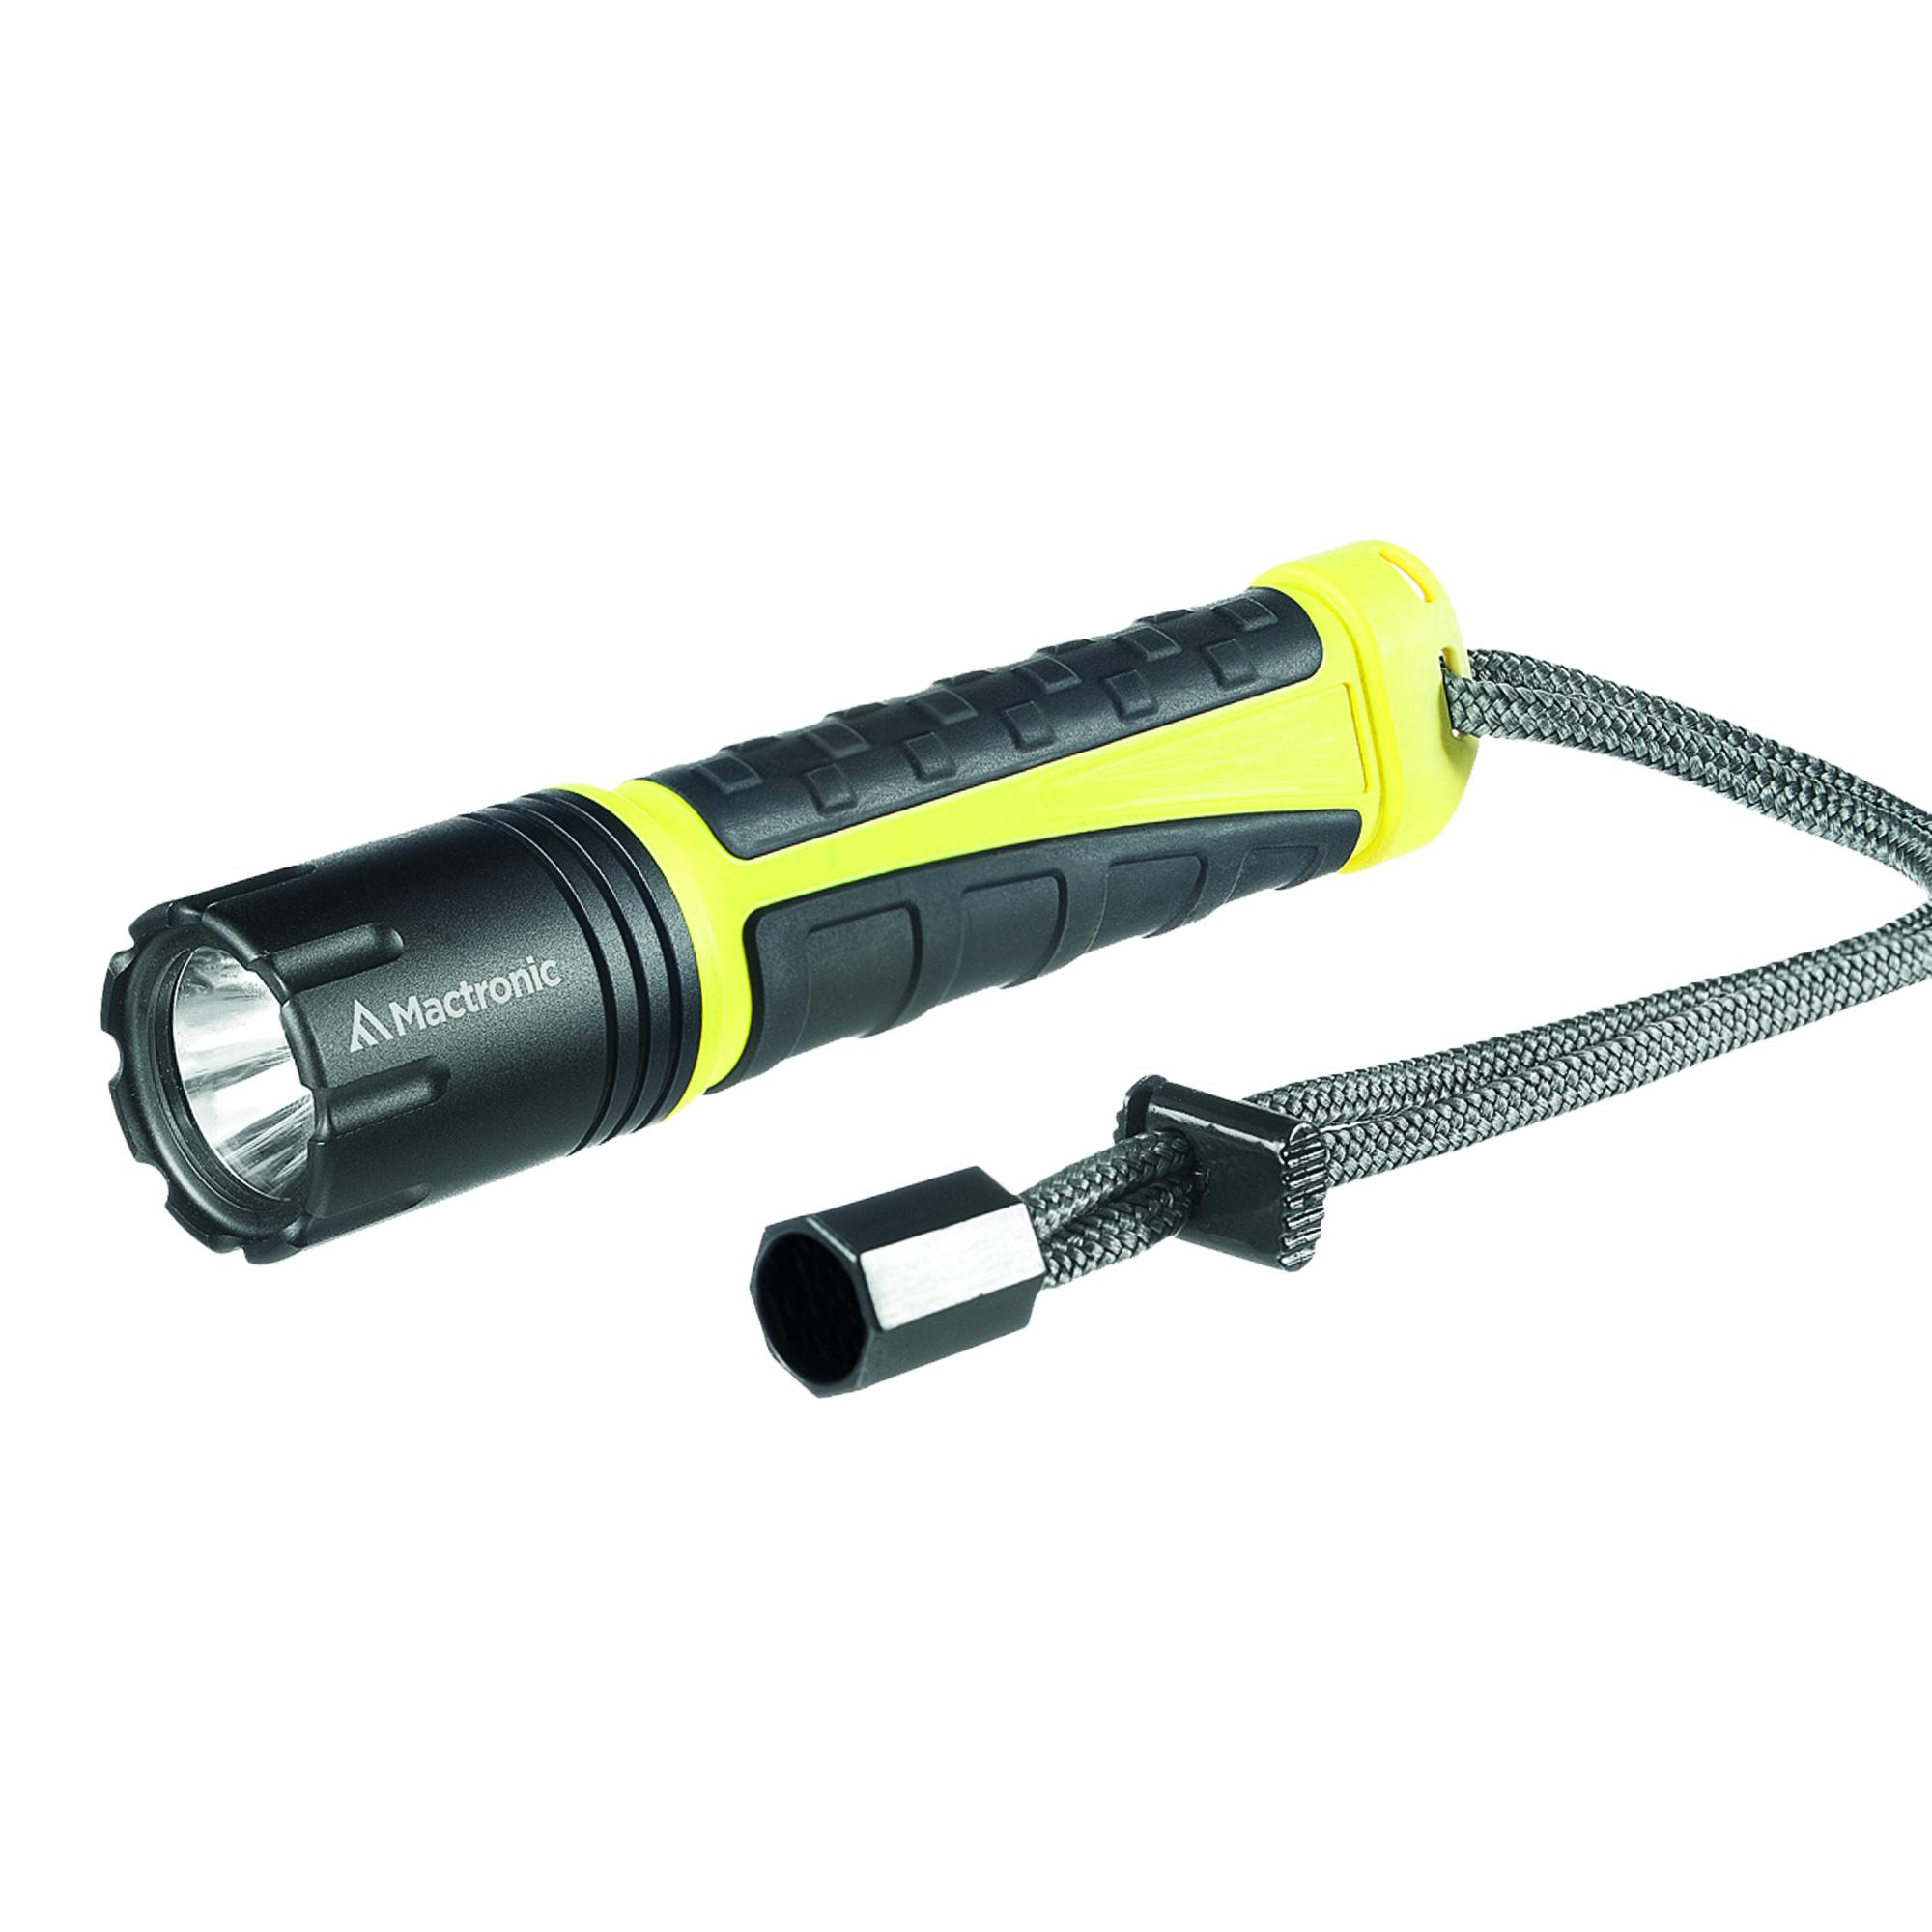 DL500 Industrie Taschenlampe Li-Ion Akku 500 lm